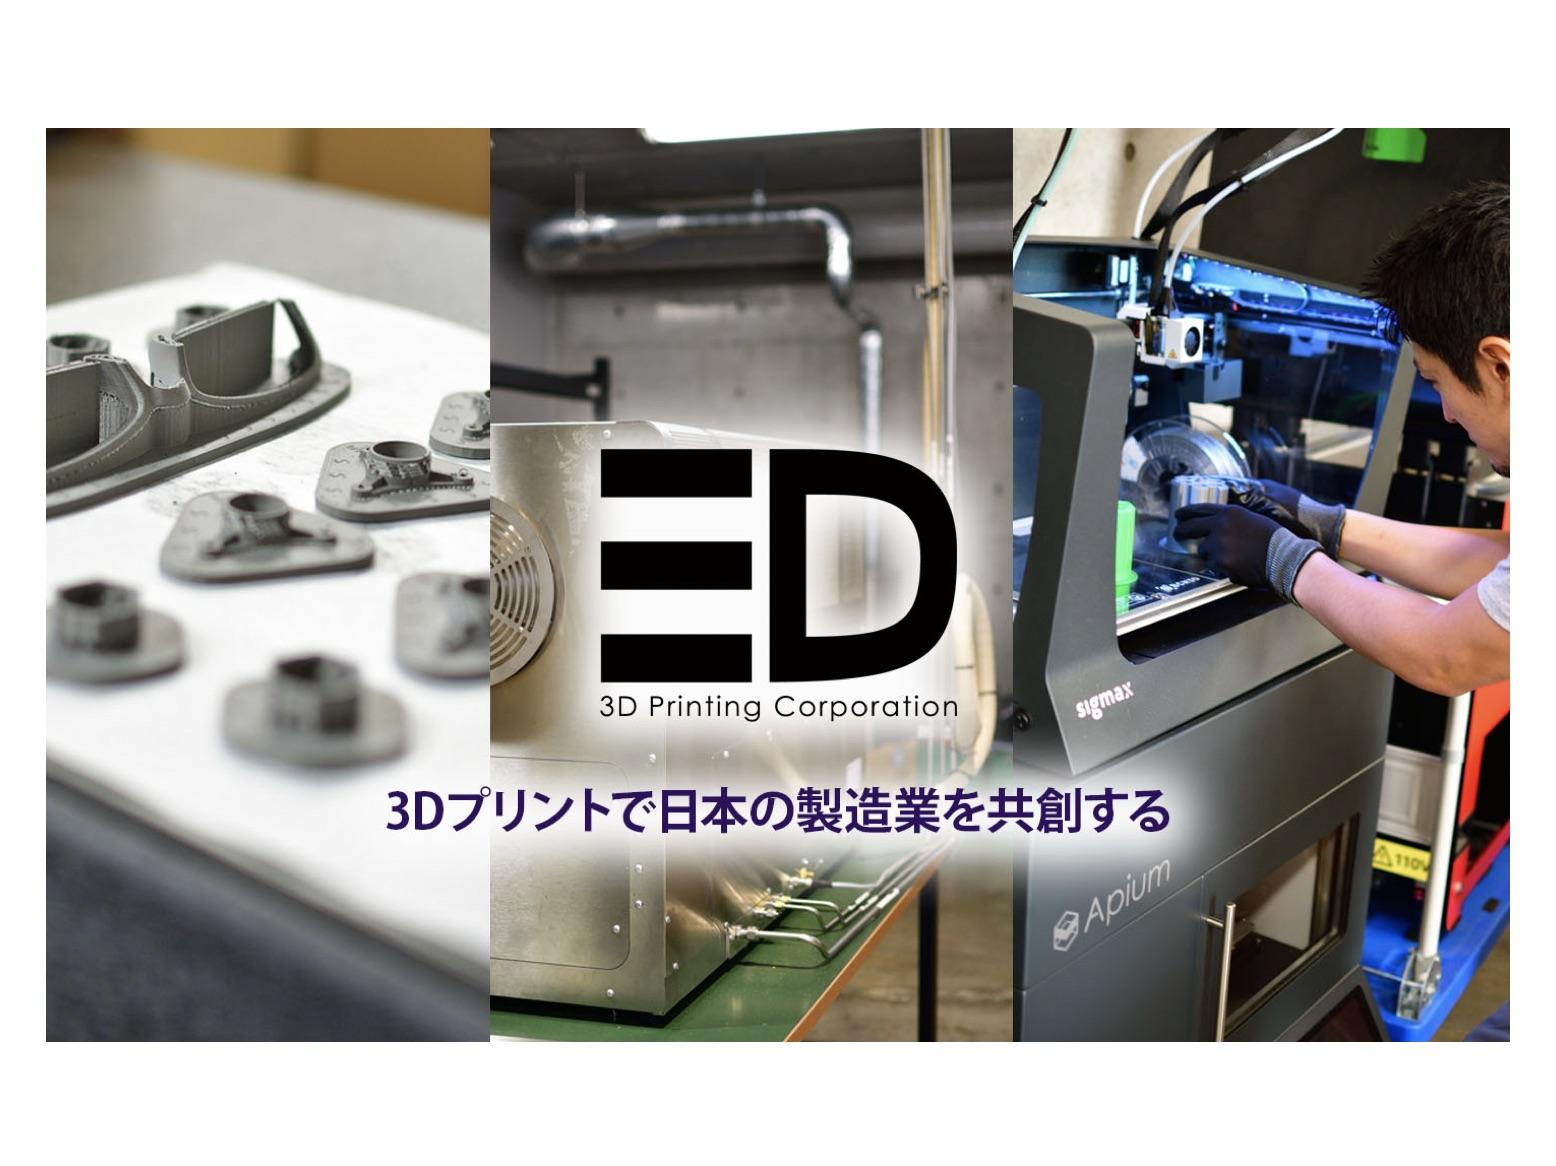 3Dプリント製造ソリューションの「3D Printing Corporation」、総額約1.3億円の資金調達を実施